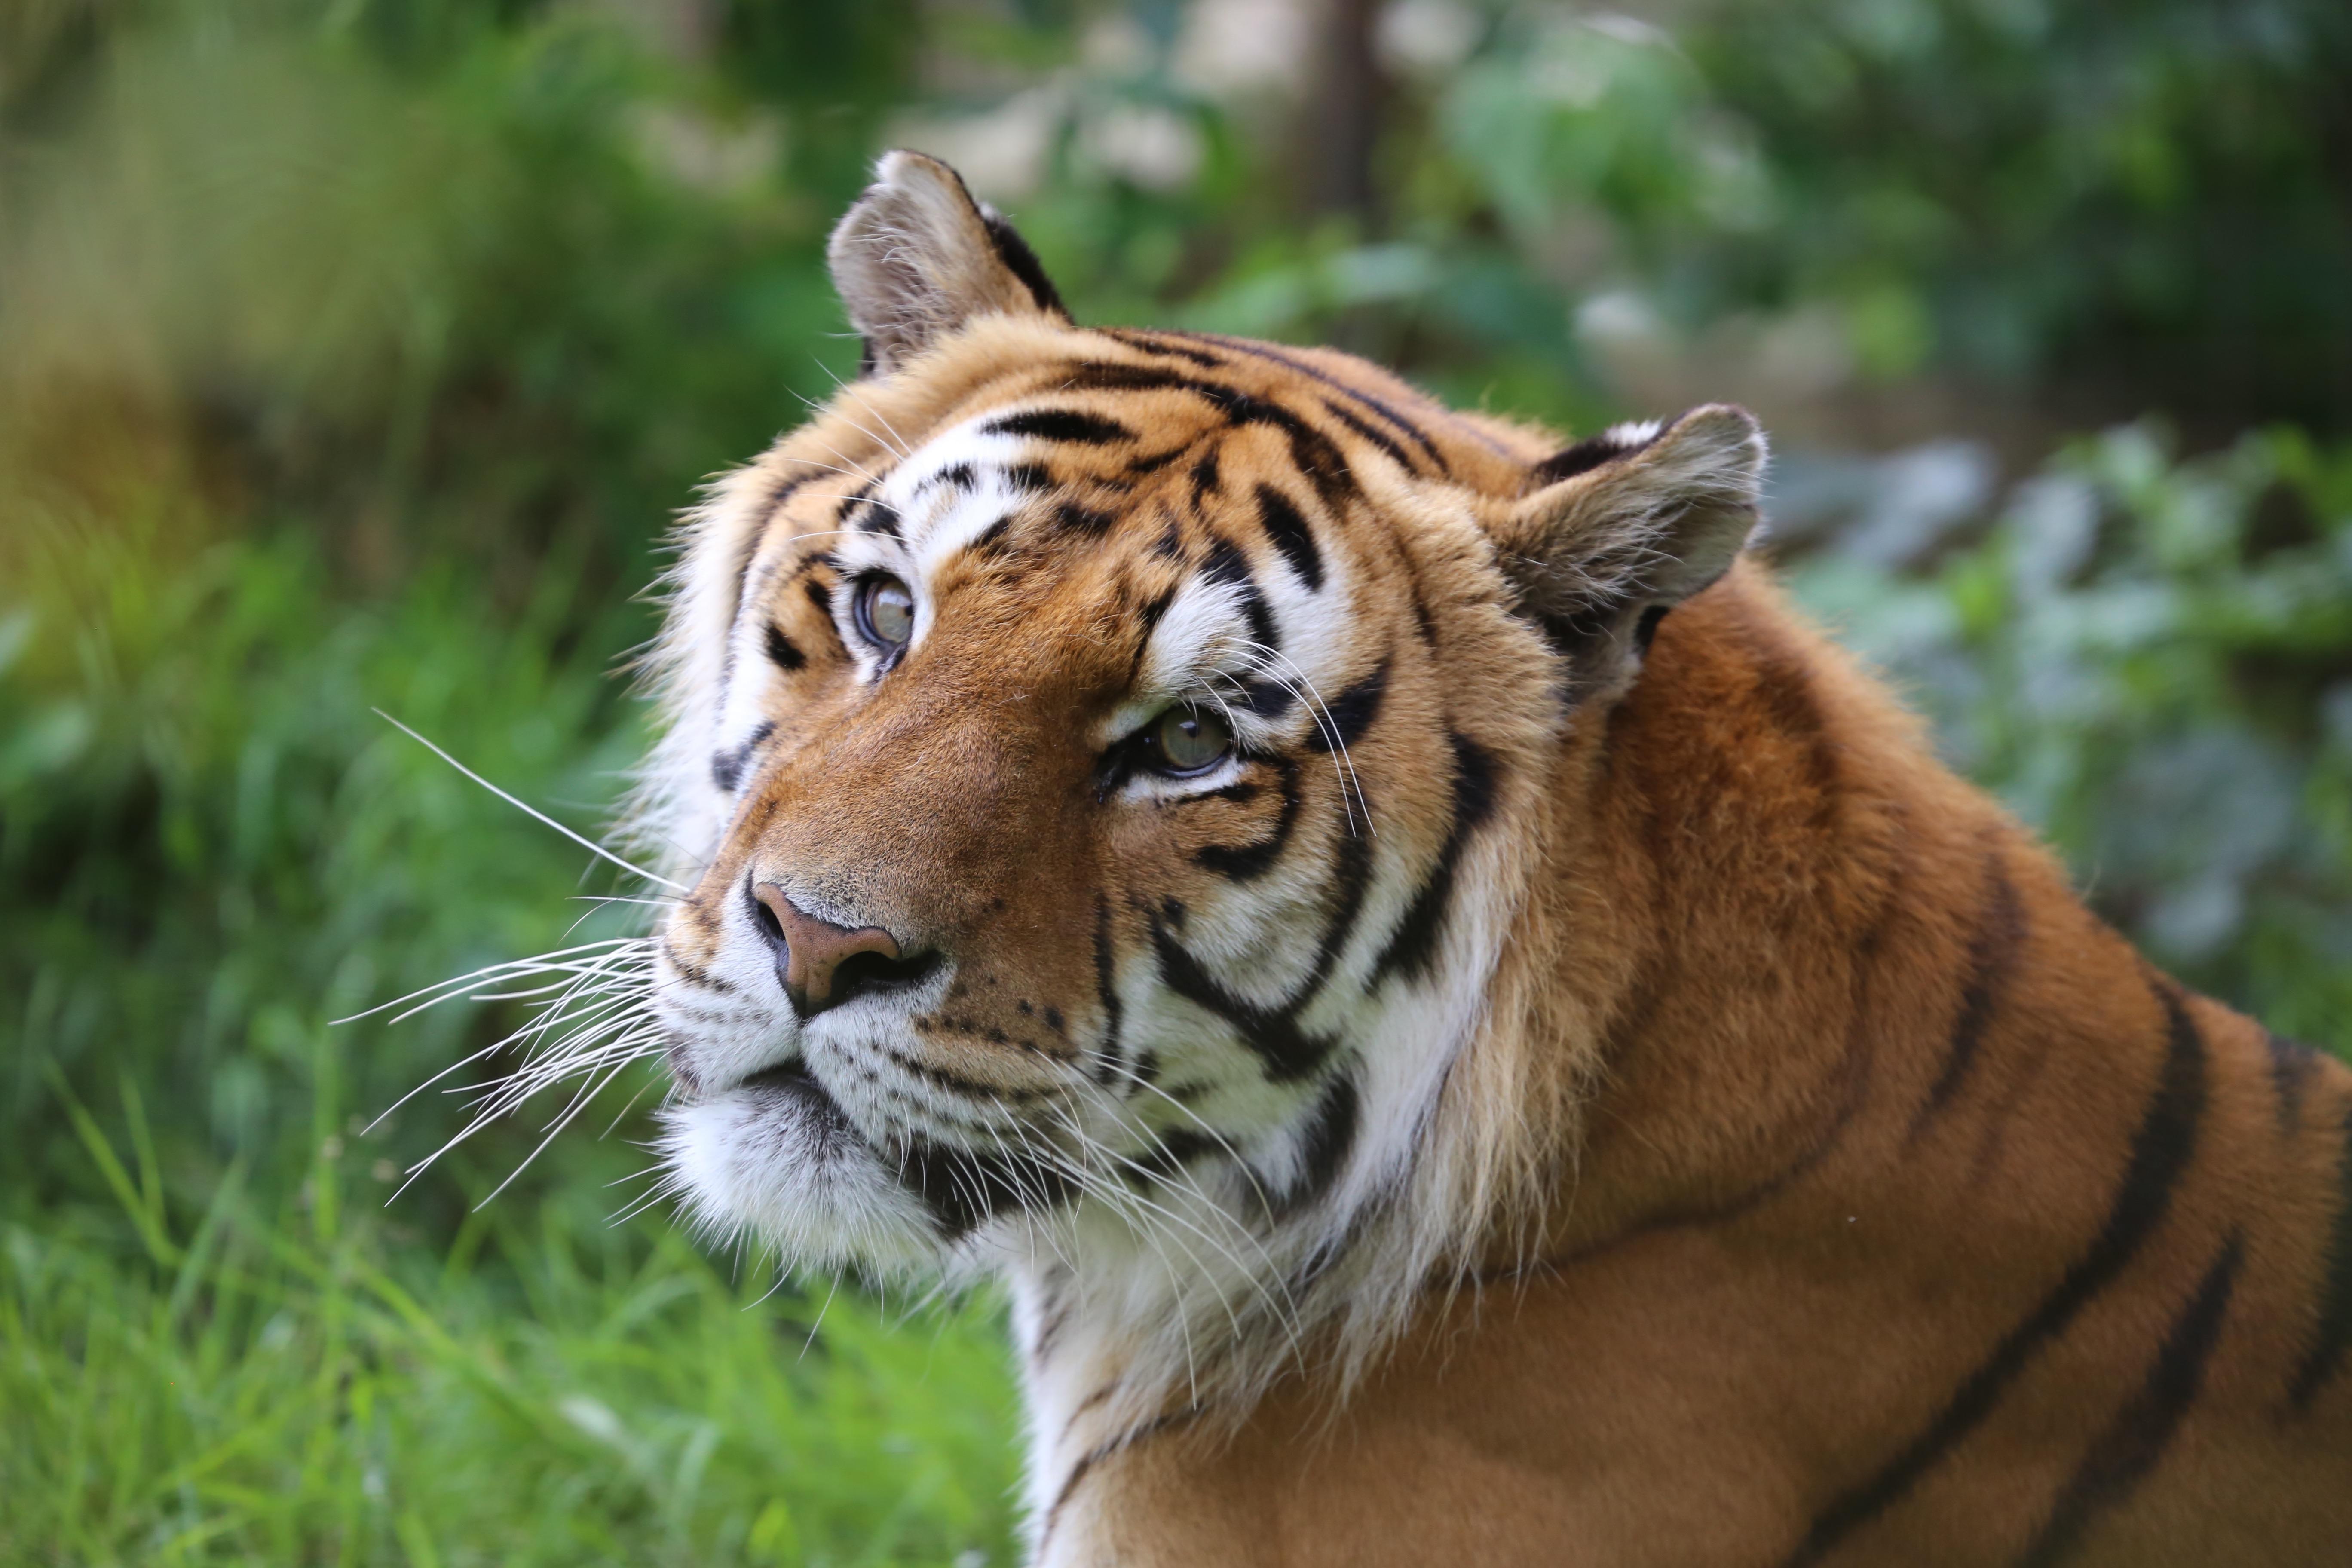 Tiger Caruso at FELIDA 2017